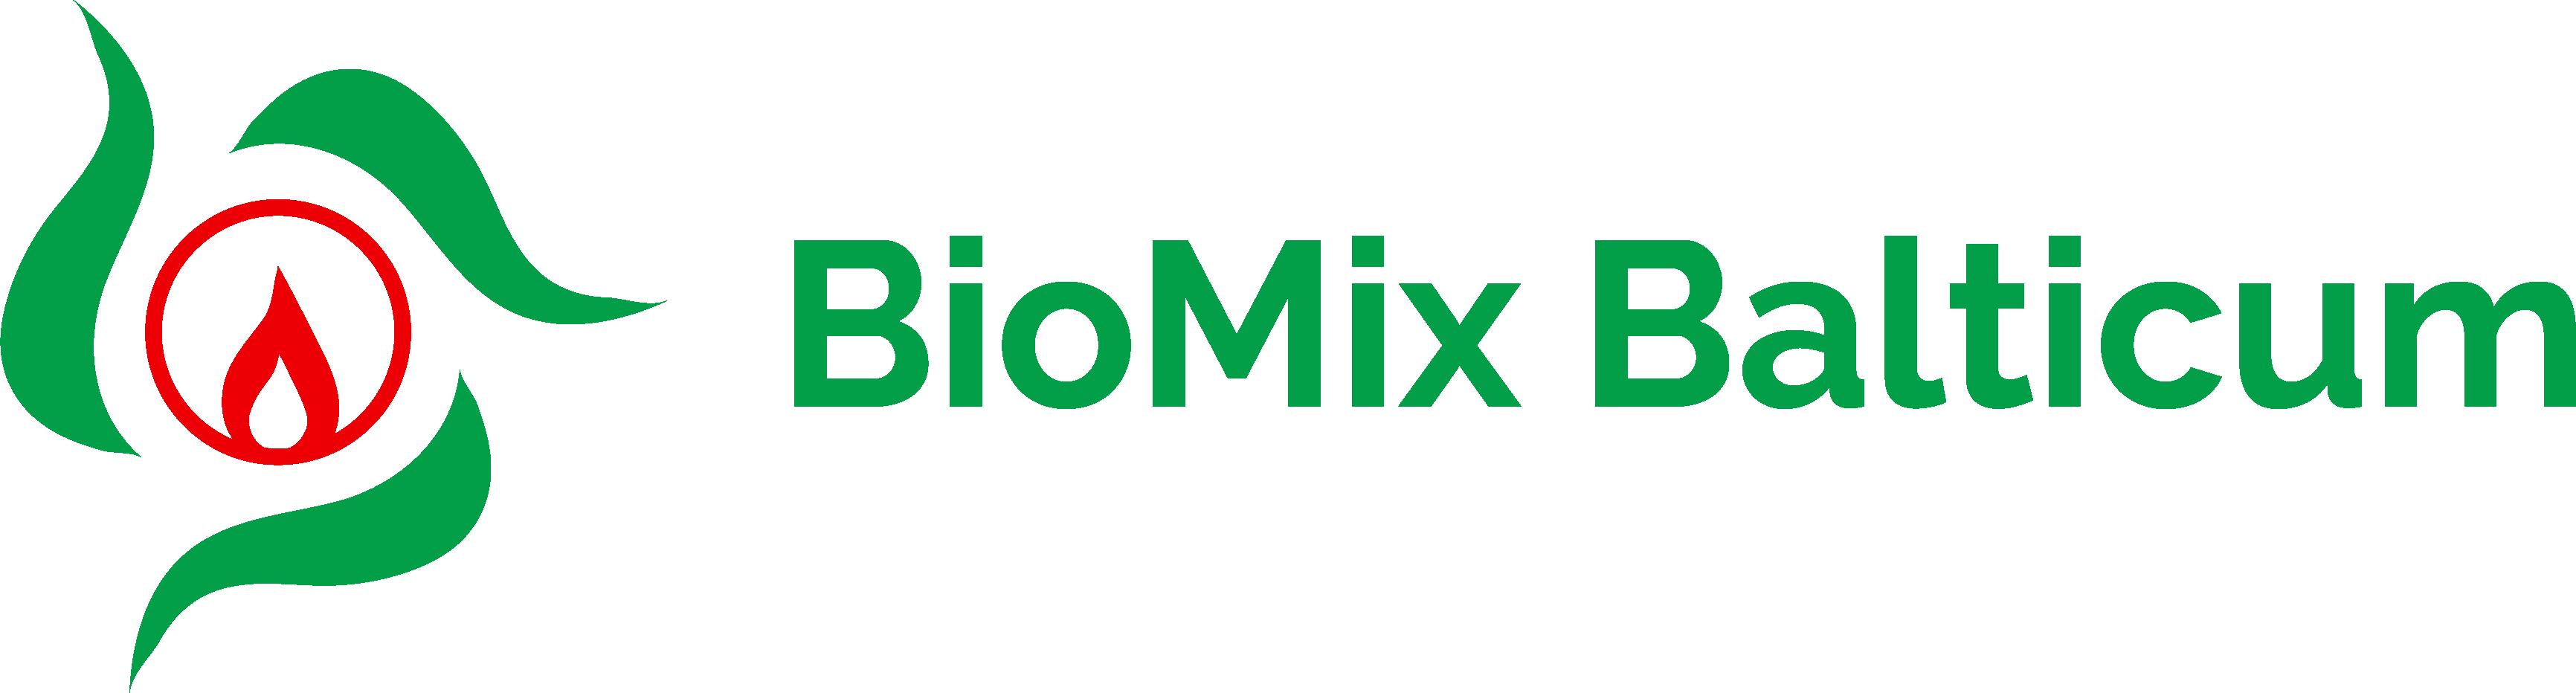 BioMix Balticum